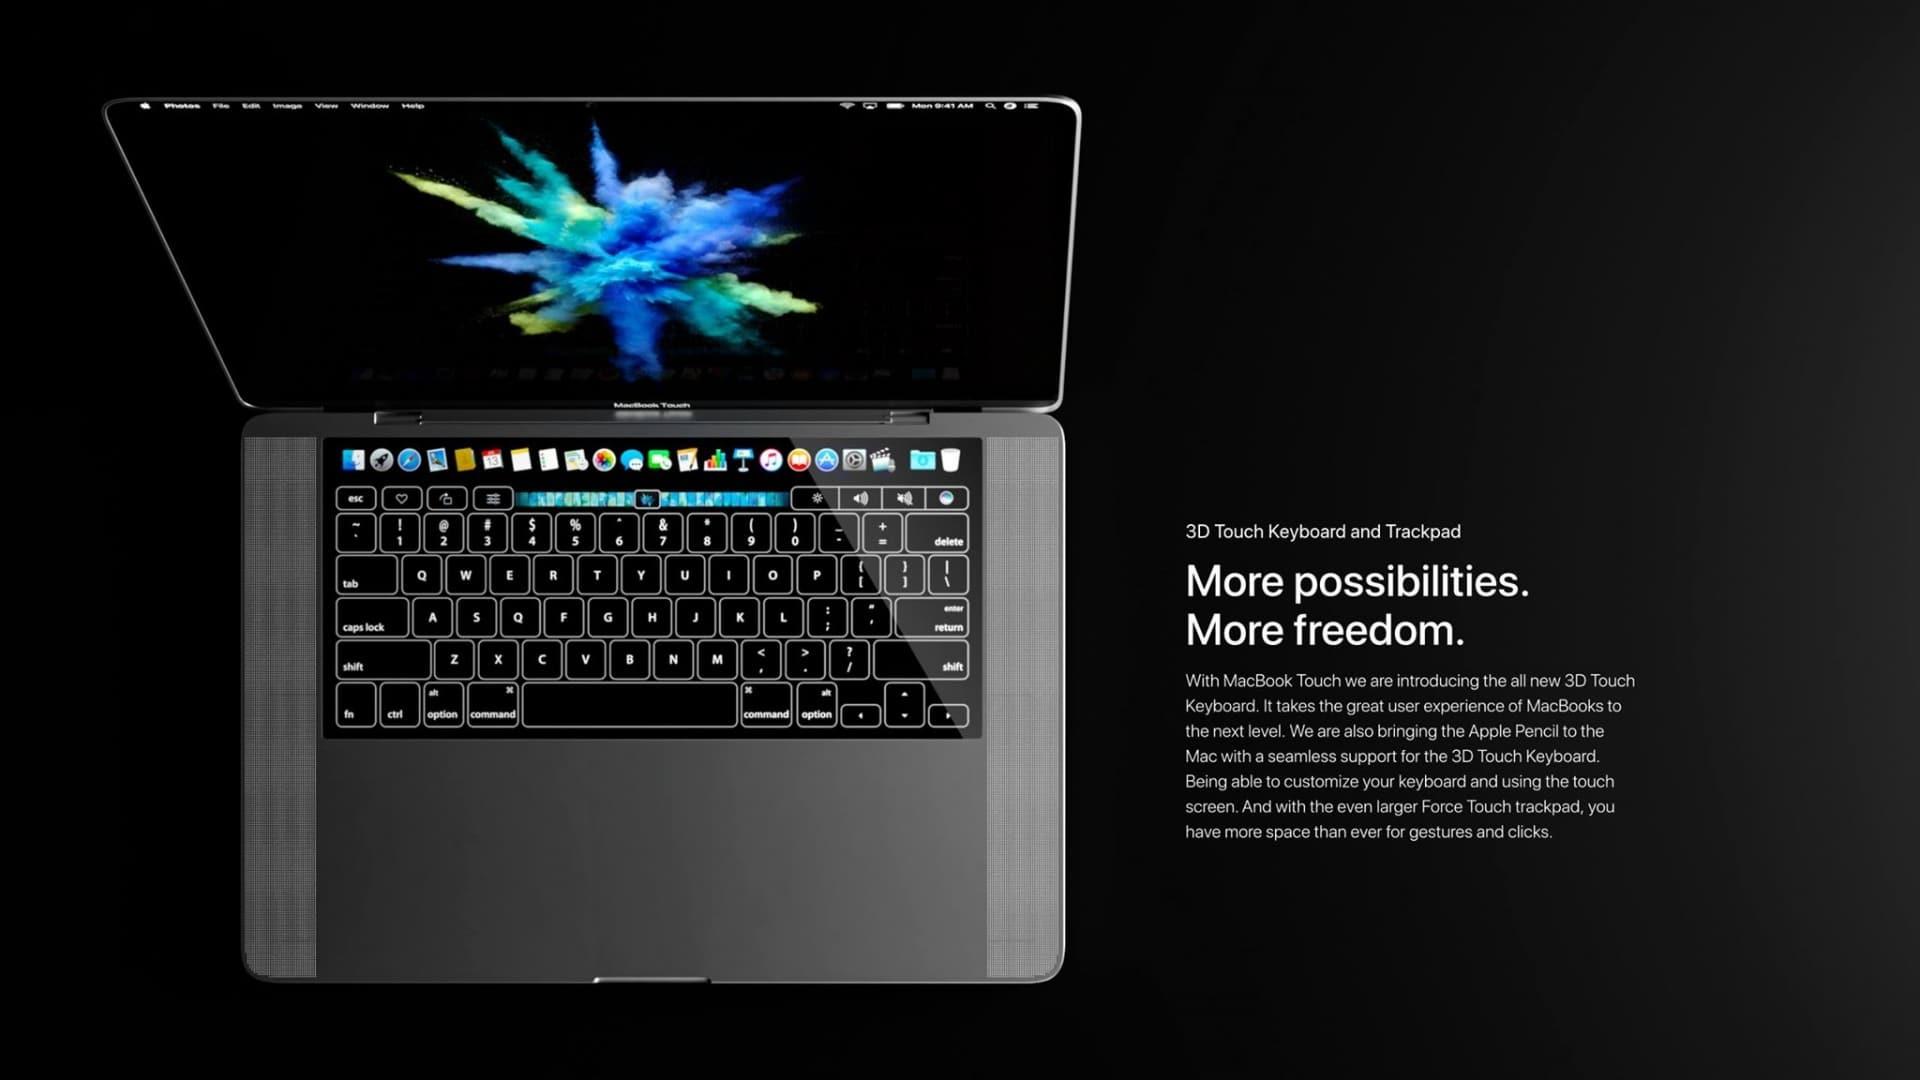 touchscreen-macbook-touchscreen-mac-4